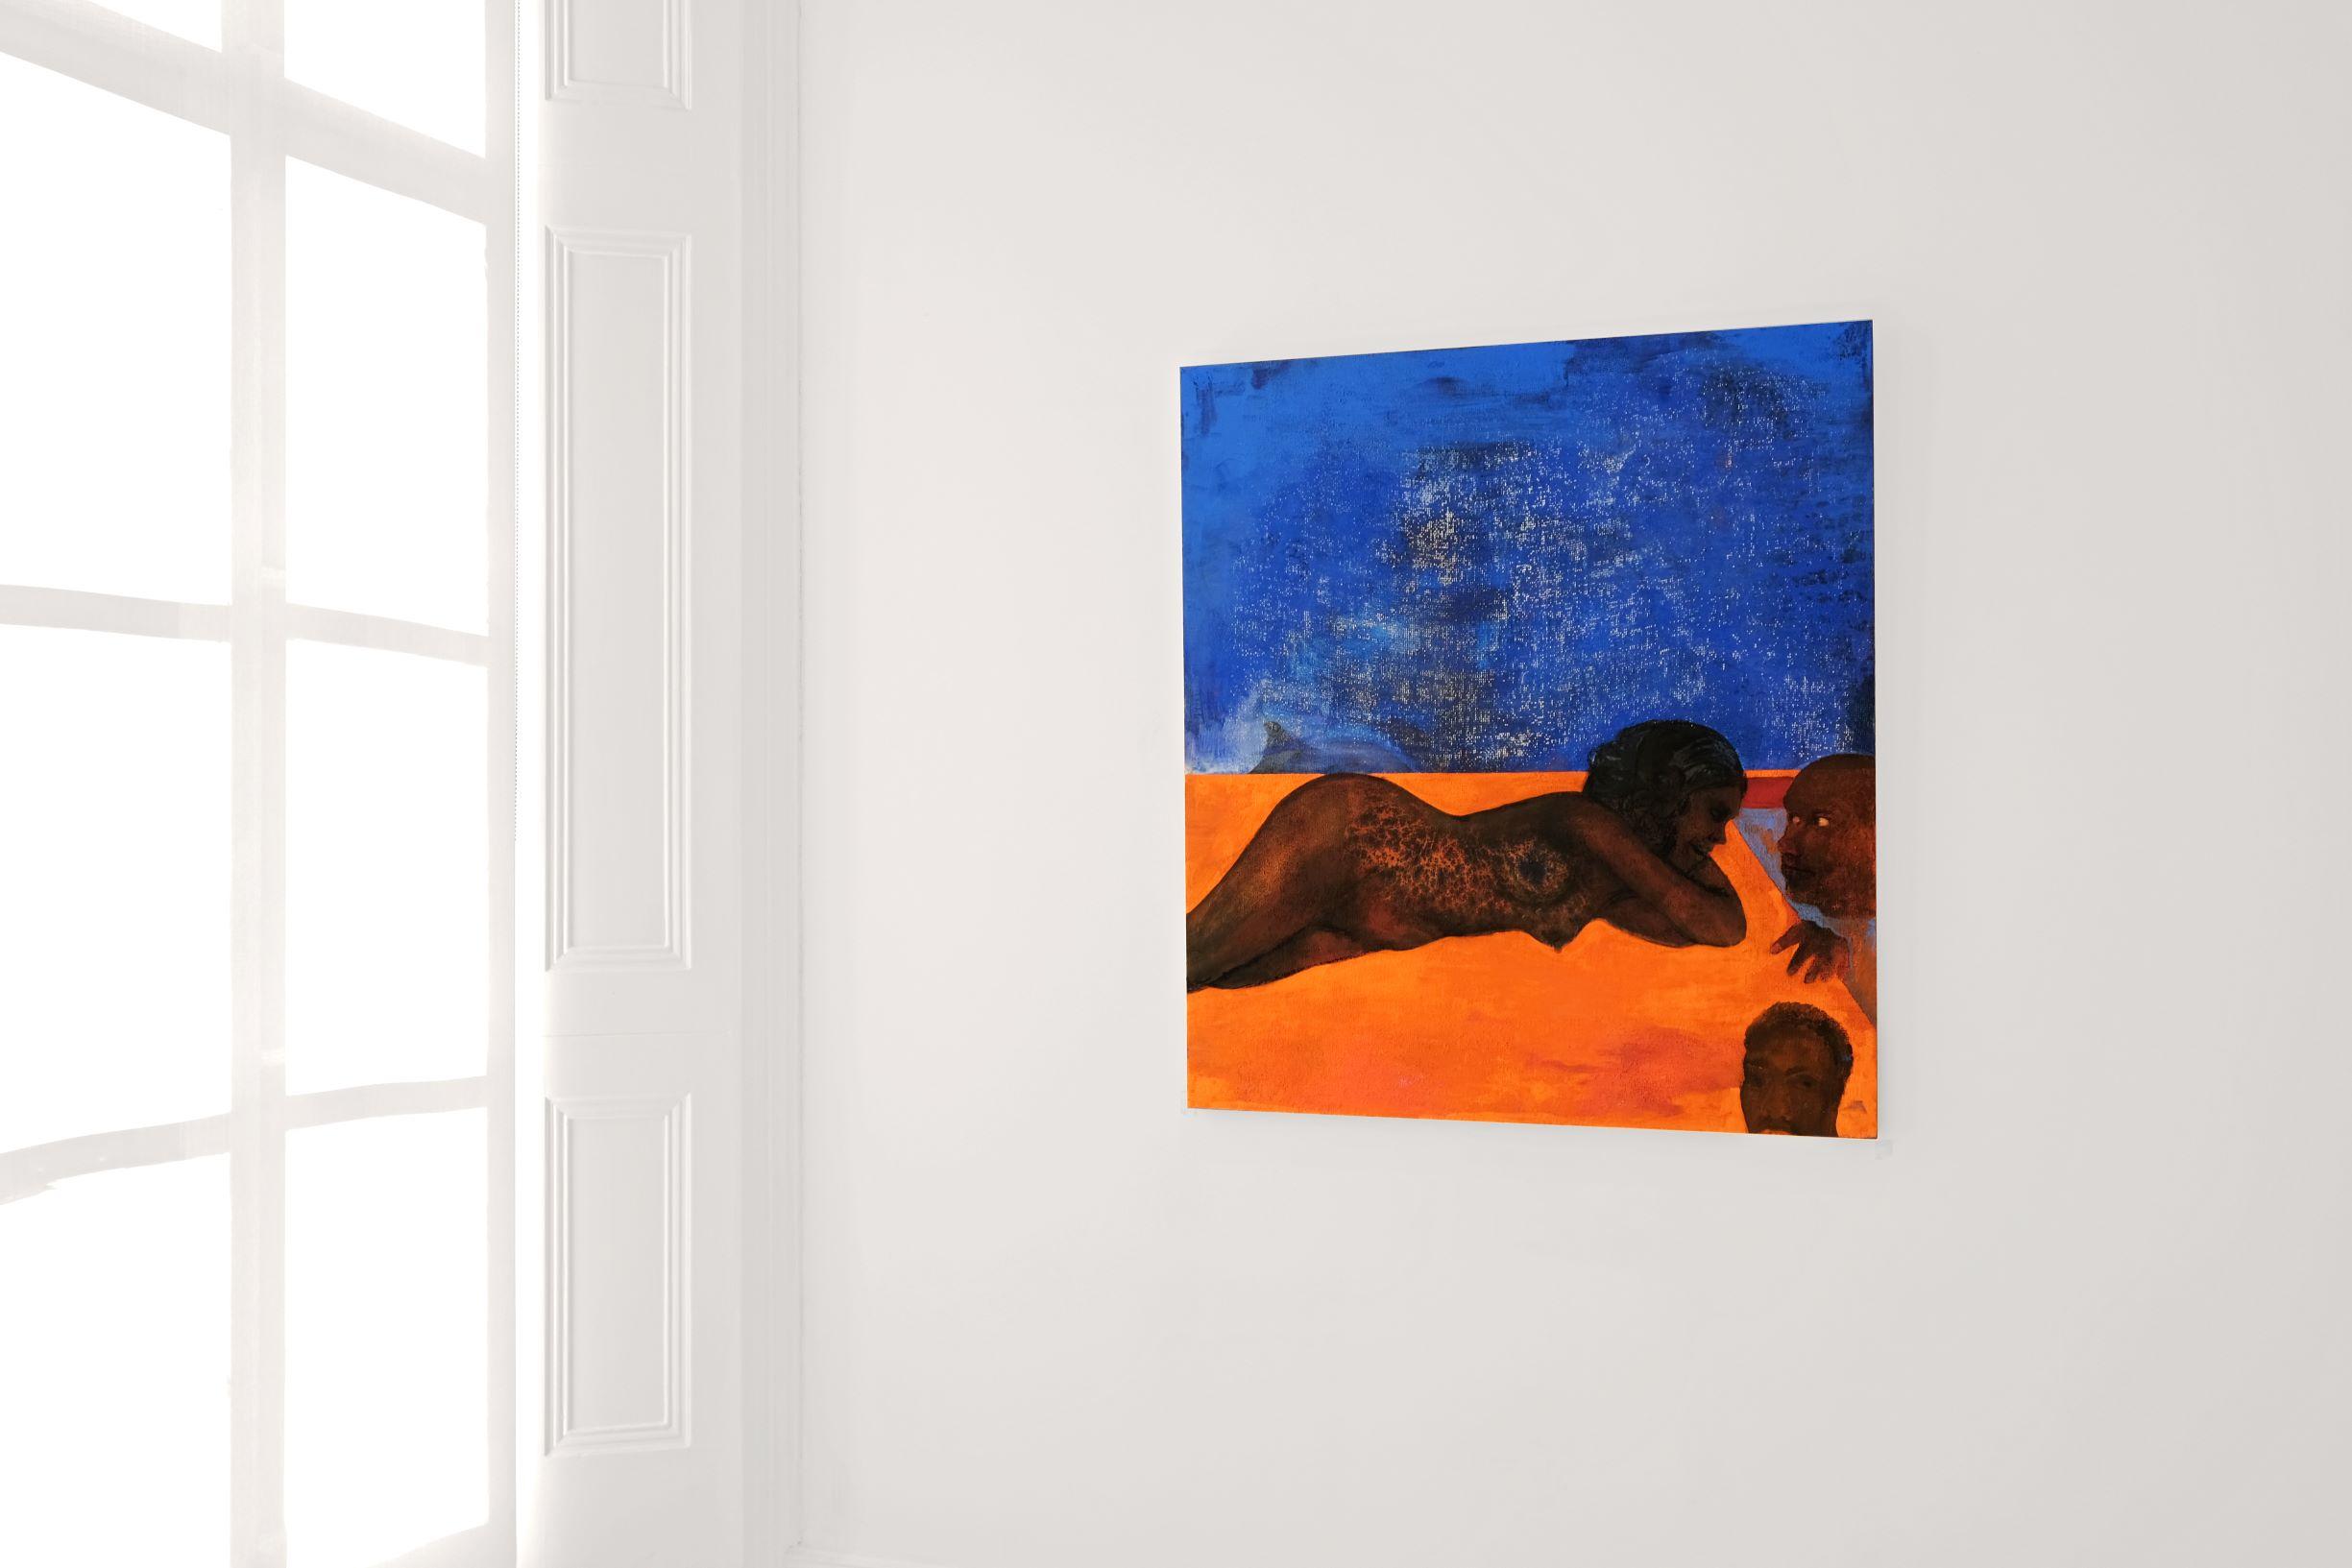 Stanislava Kovalcikova, Cautionary Tales, In Pool 2020 Oil on linen 109×99 cm, courtesy of MAMOTH